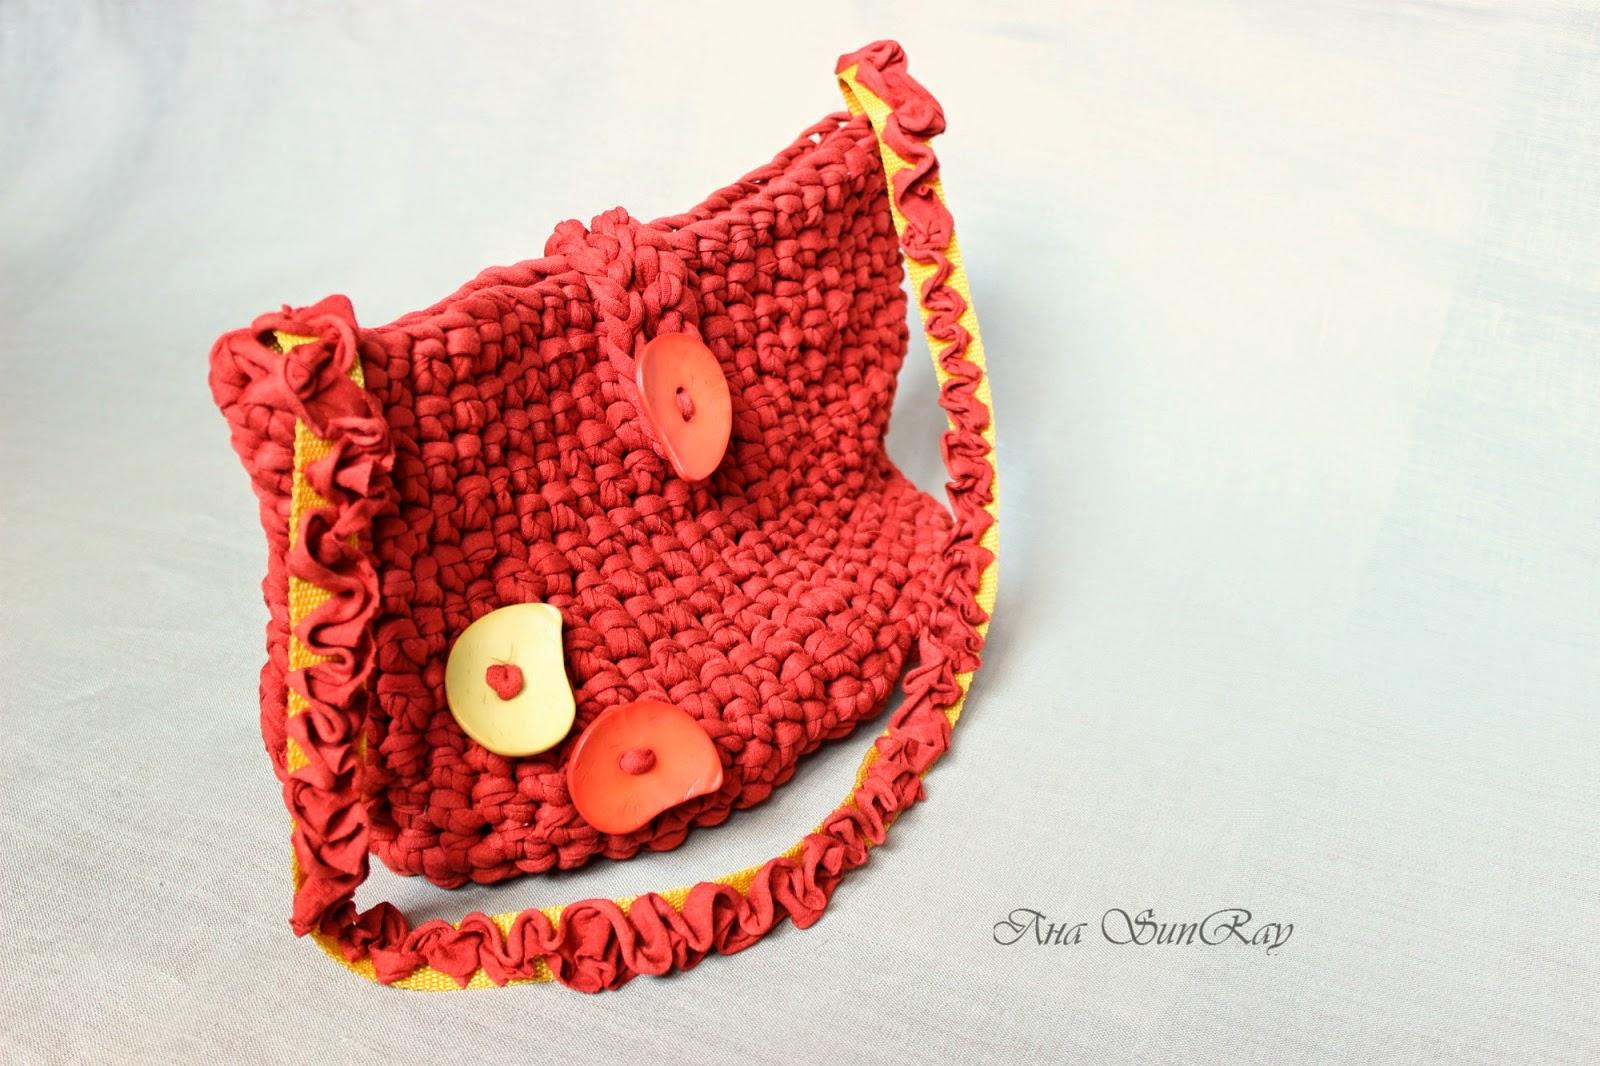 вязаная сумка, сумка бохо, детская сумка, яркая сумка, сумка в этностиле,  этносумка, красивая сумка, летняя сумочка